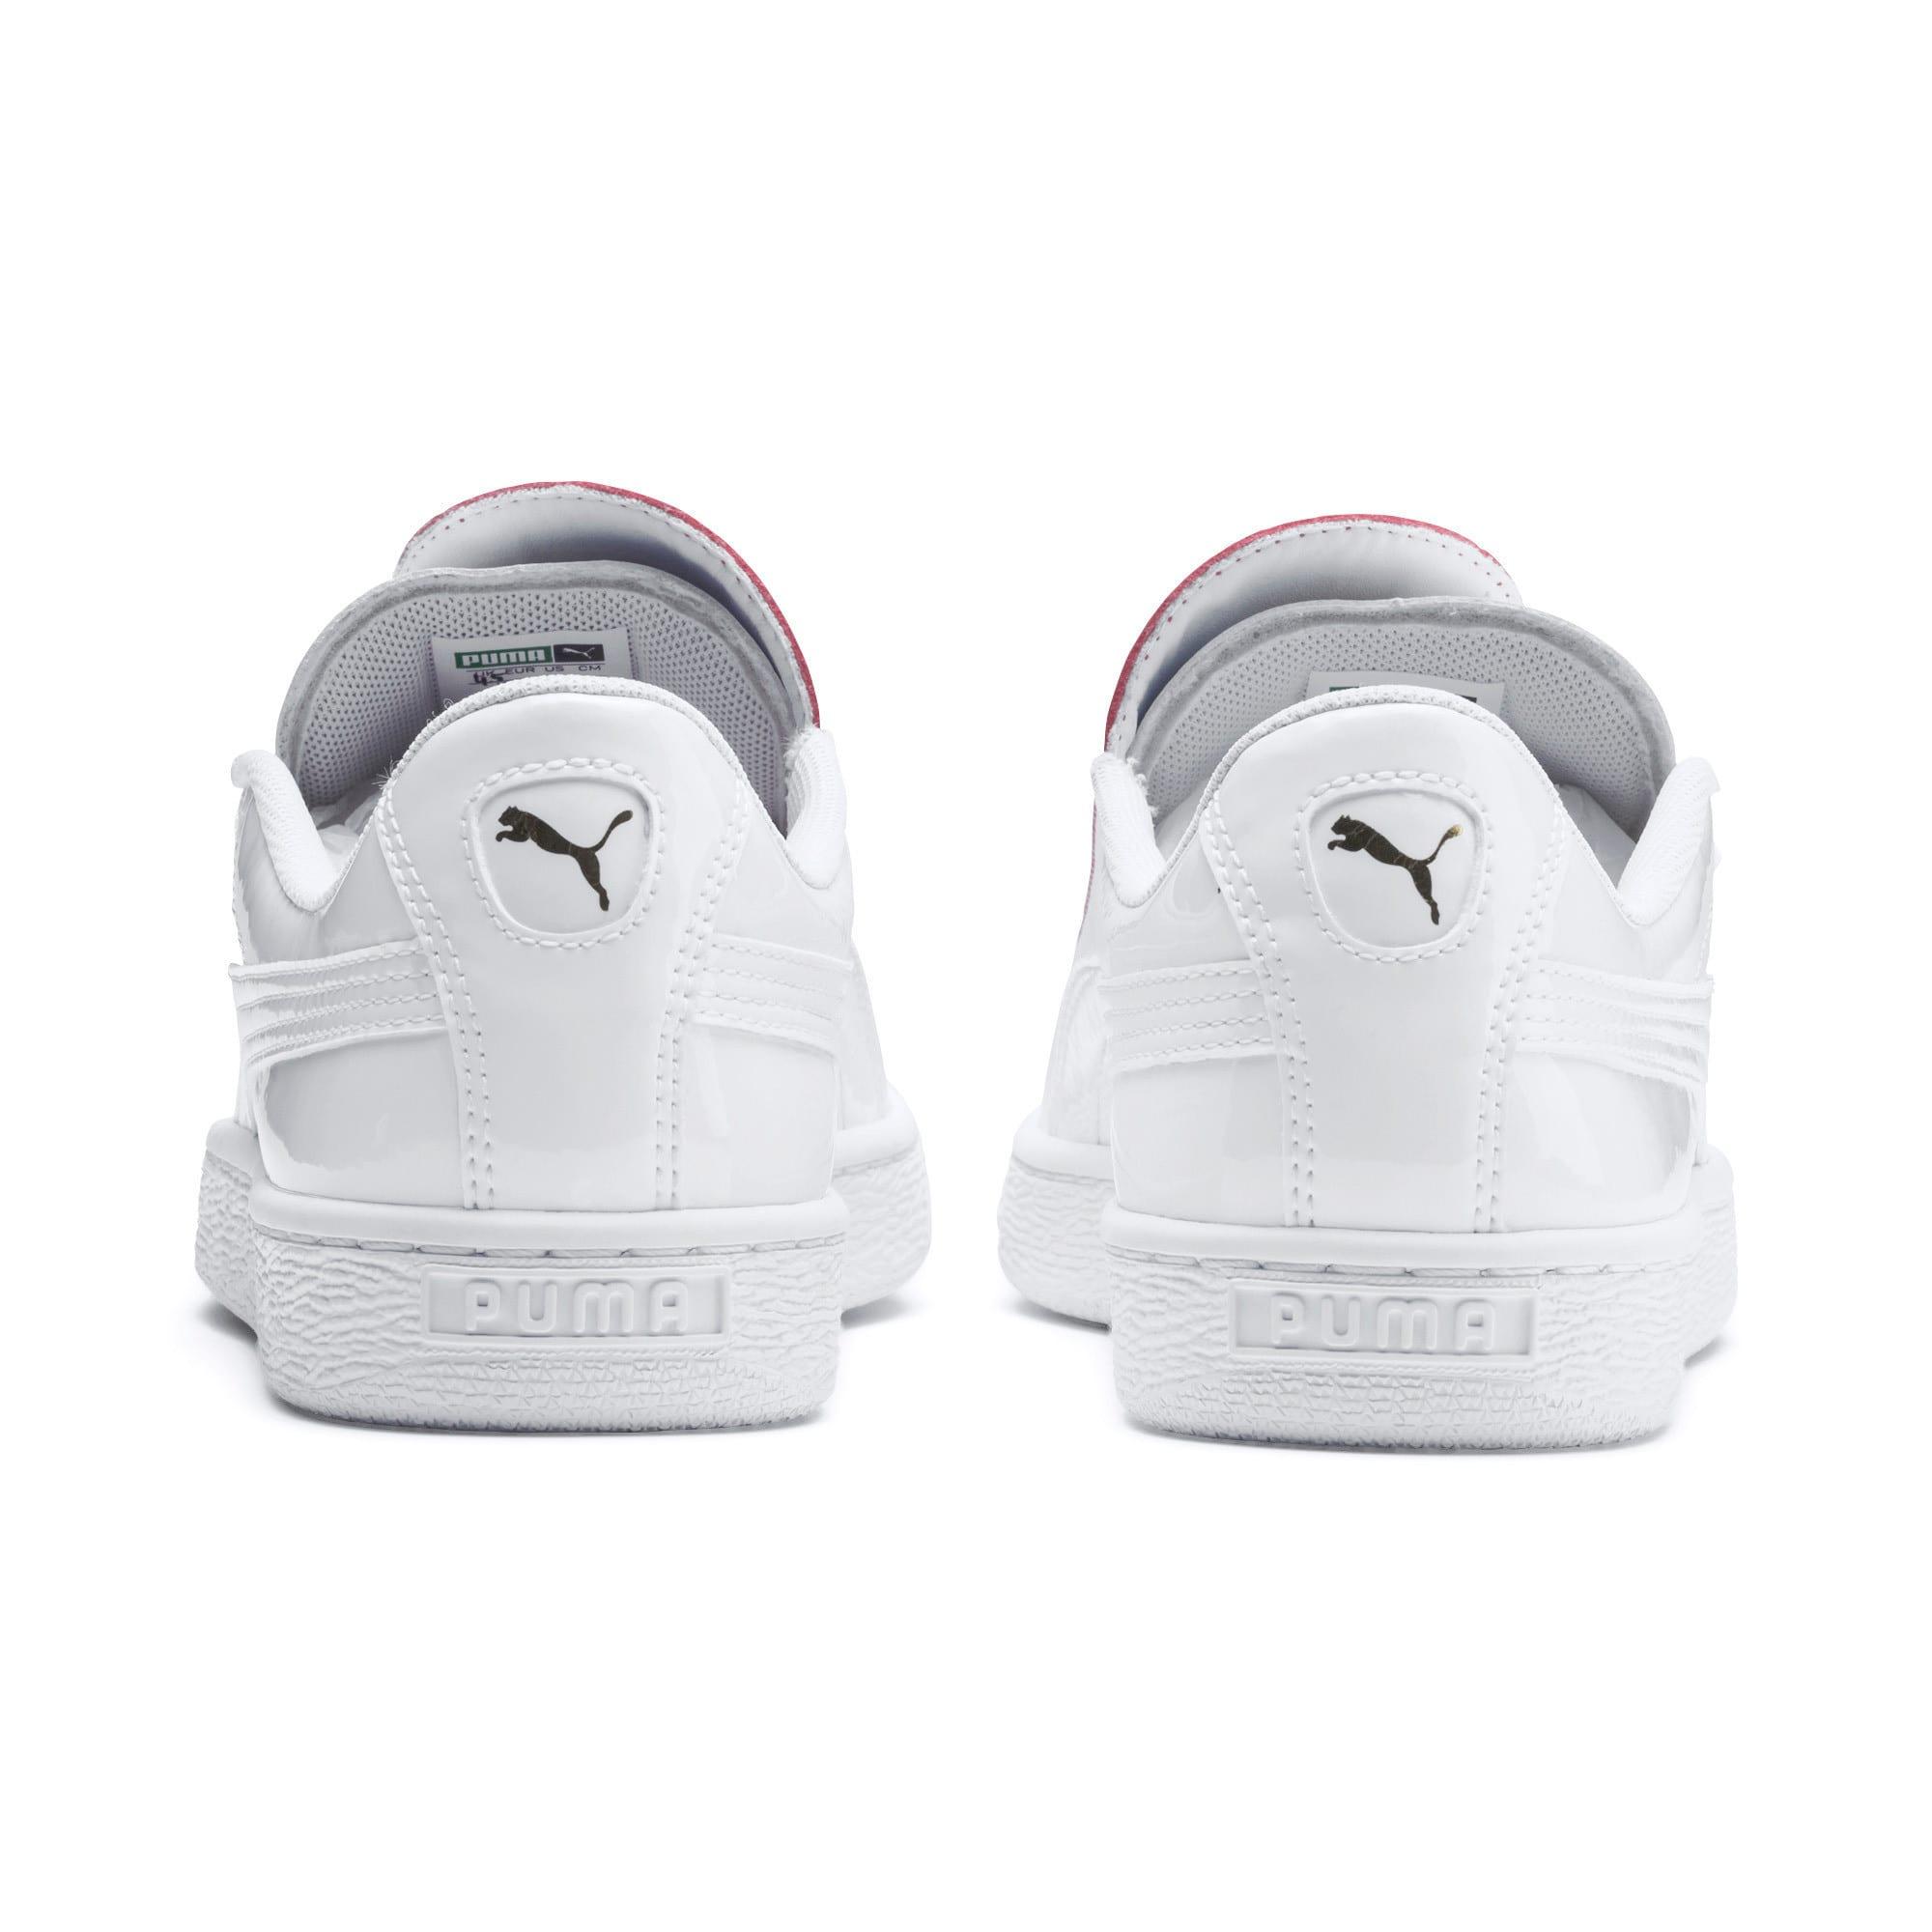 Thumbnail 4 of Basket Crush Women's Sneakers, Puma White-Hibiscus, medium